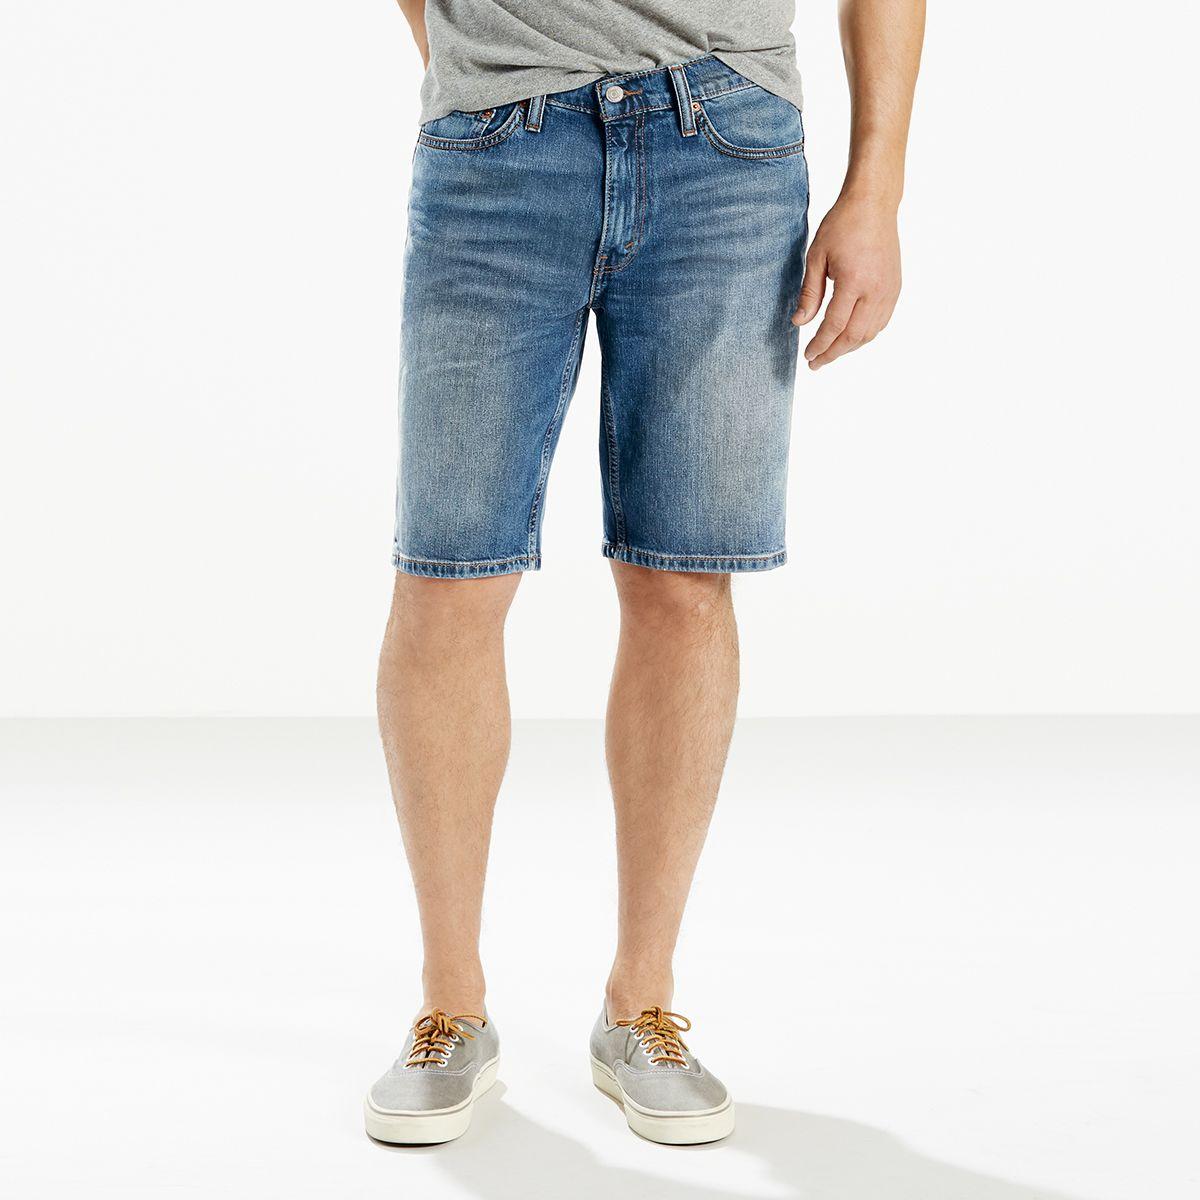 231d7ff8 Levi's Mens Shorts & Cargo Shorts - Macy's